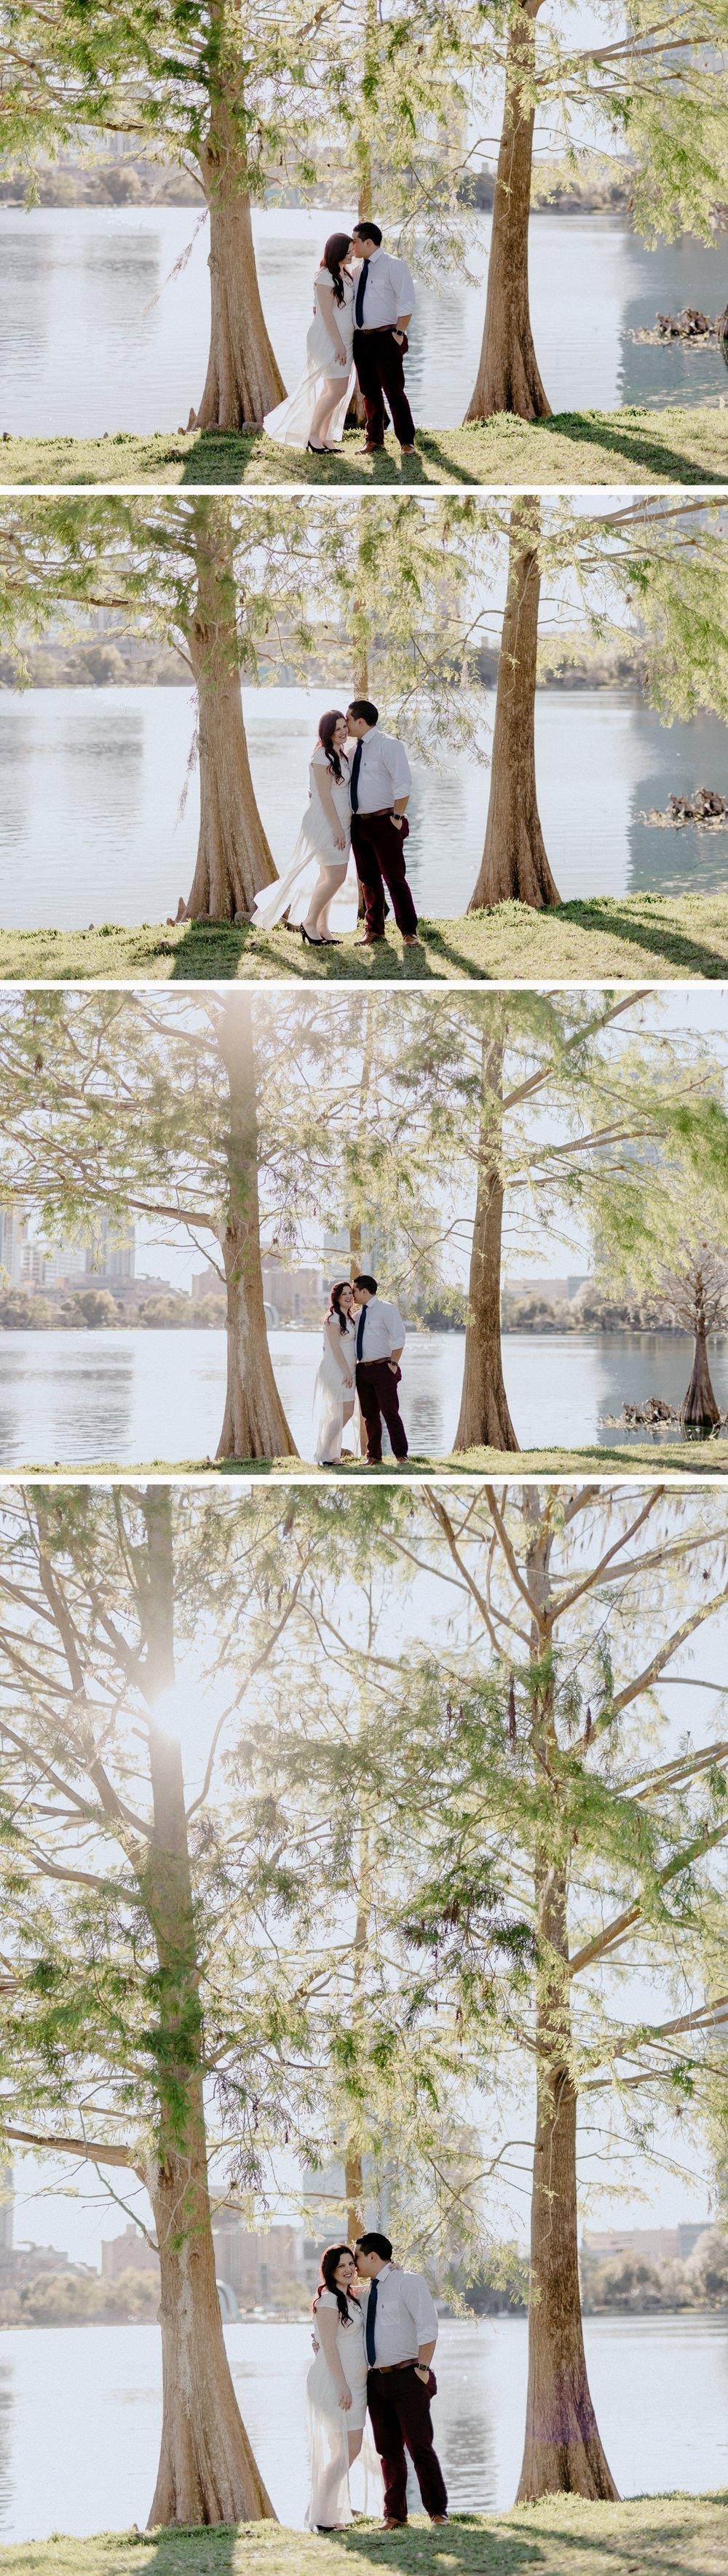 Bibi-And-Josh-Lake-Eola-Engagement_0009.jpg